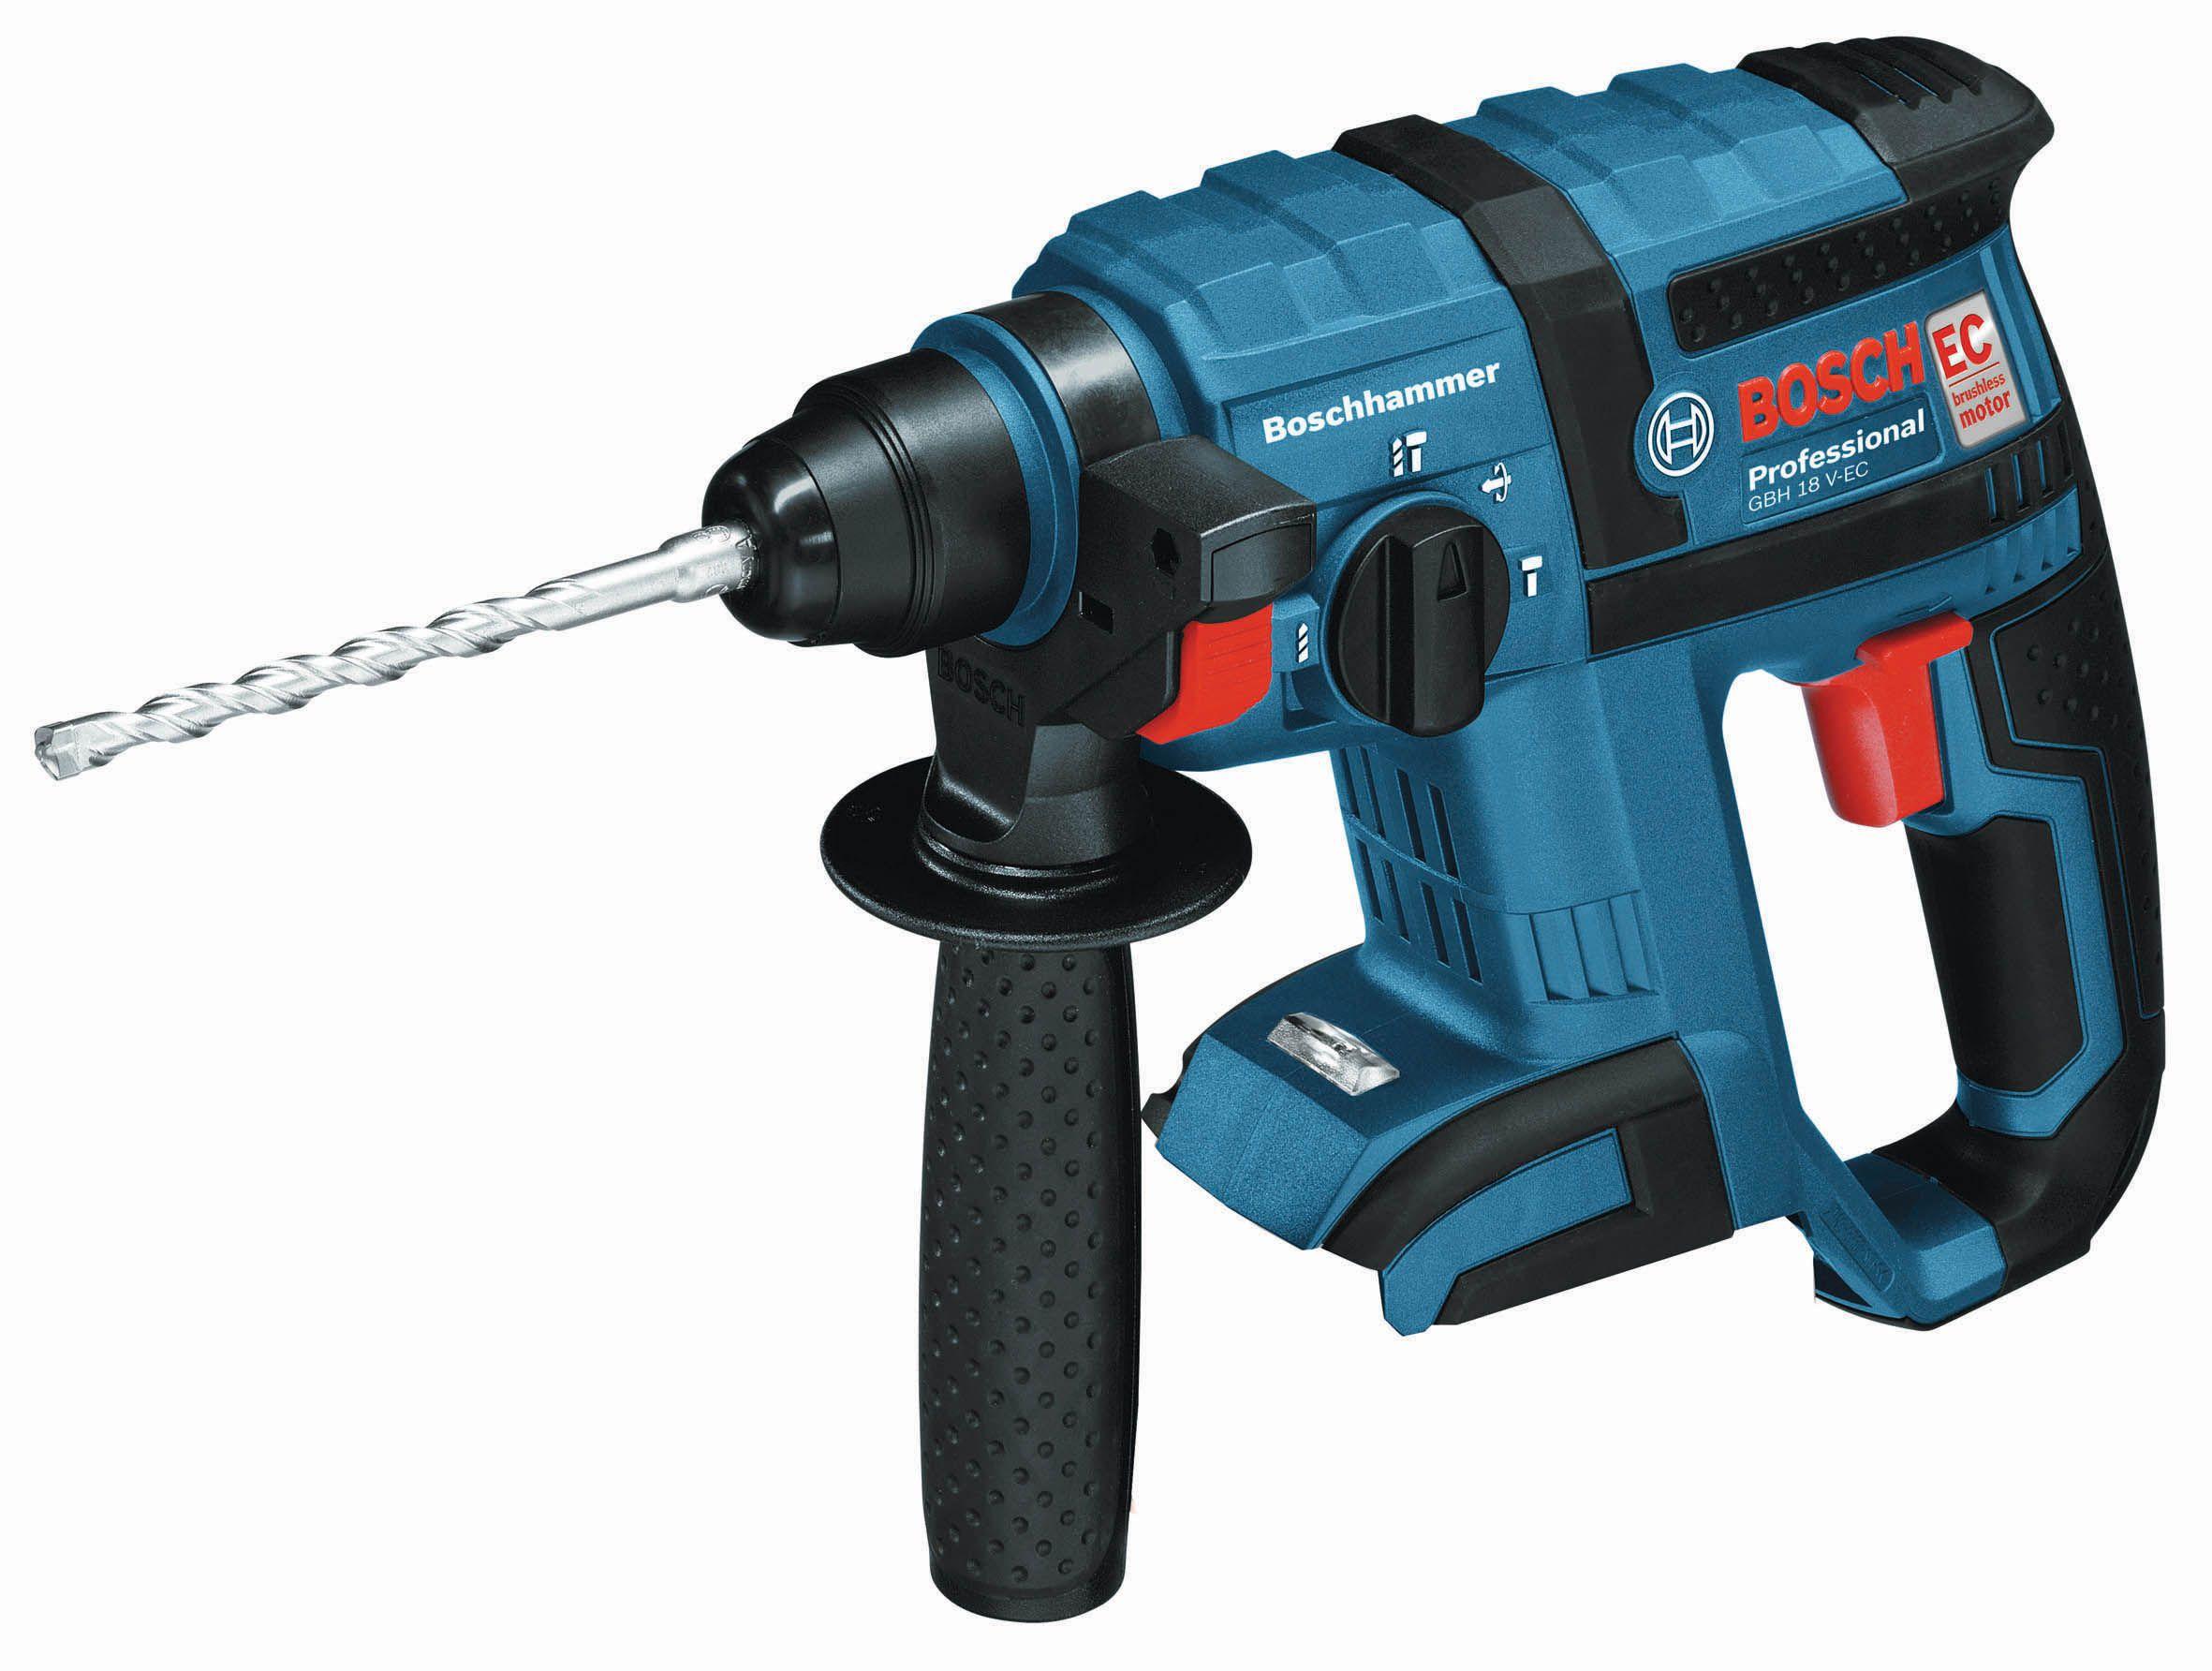 Bosch Professional Cordless 18v 4ah Li-ion Rotary Hammer Drill Gbh 18 V-ec - Bare